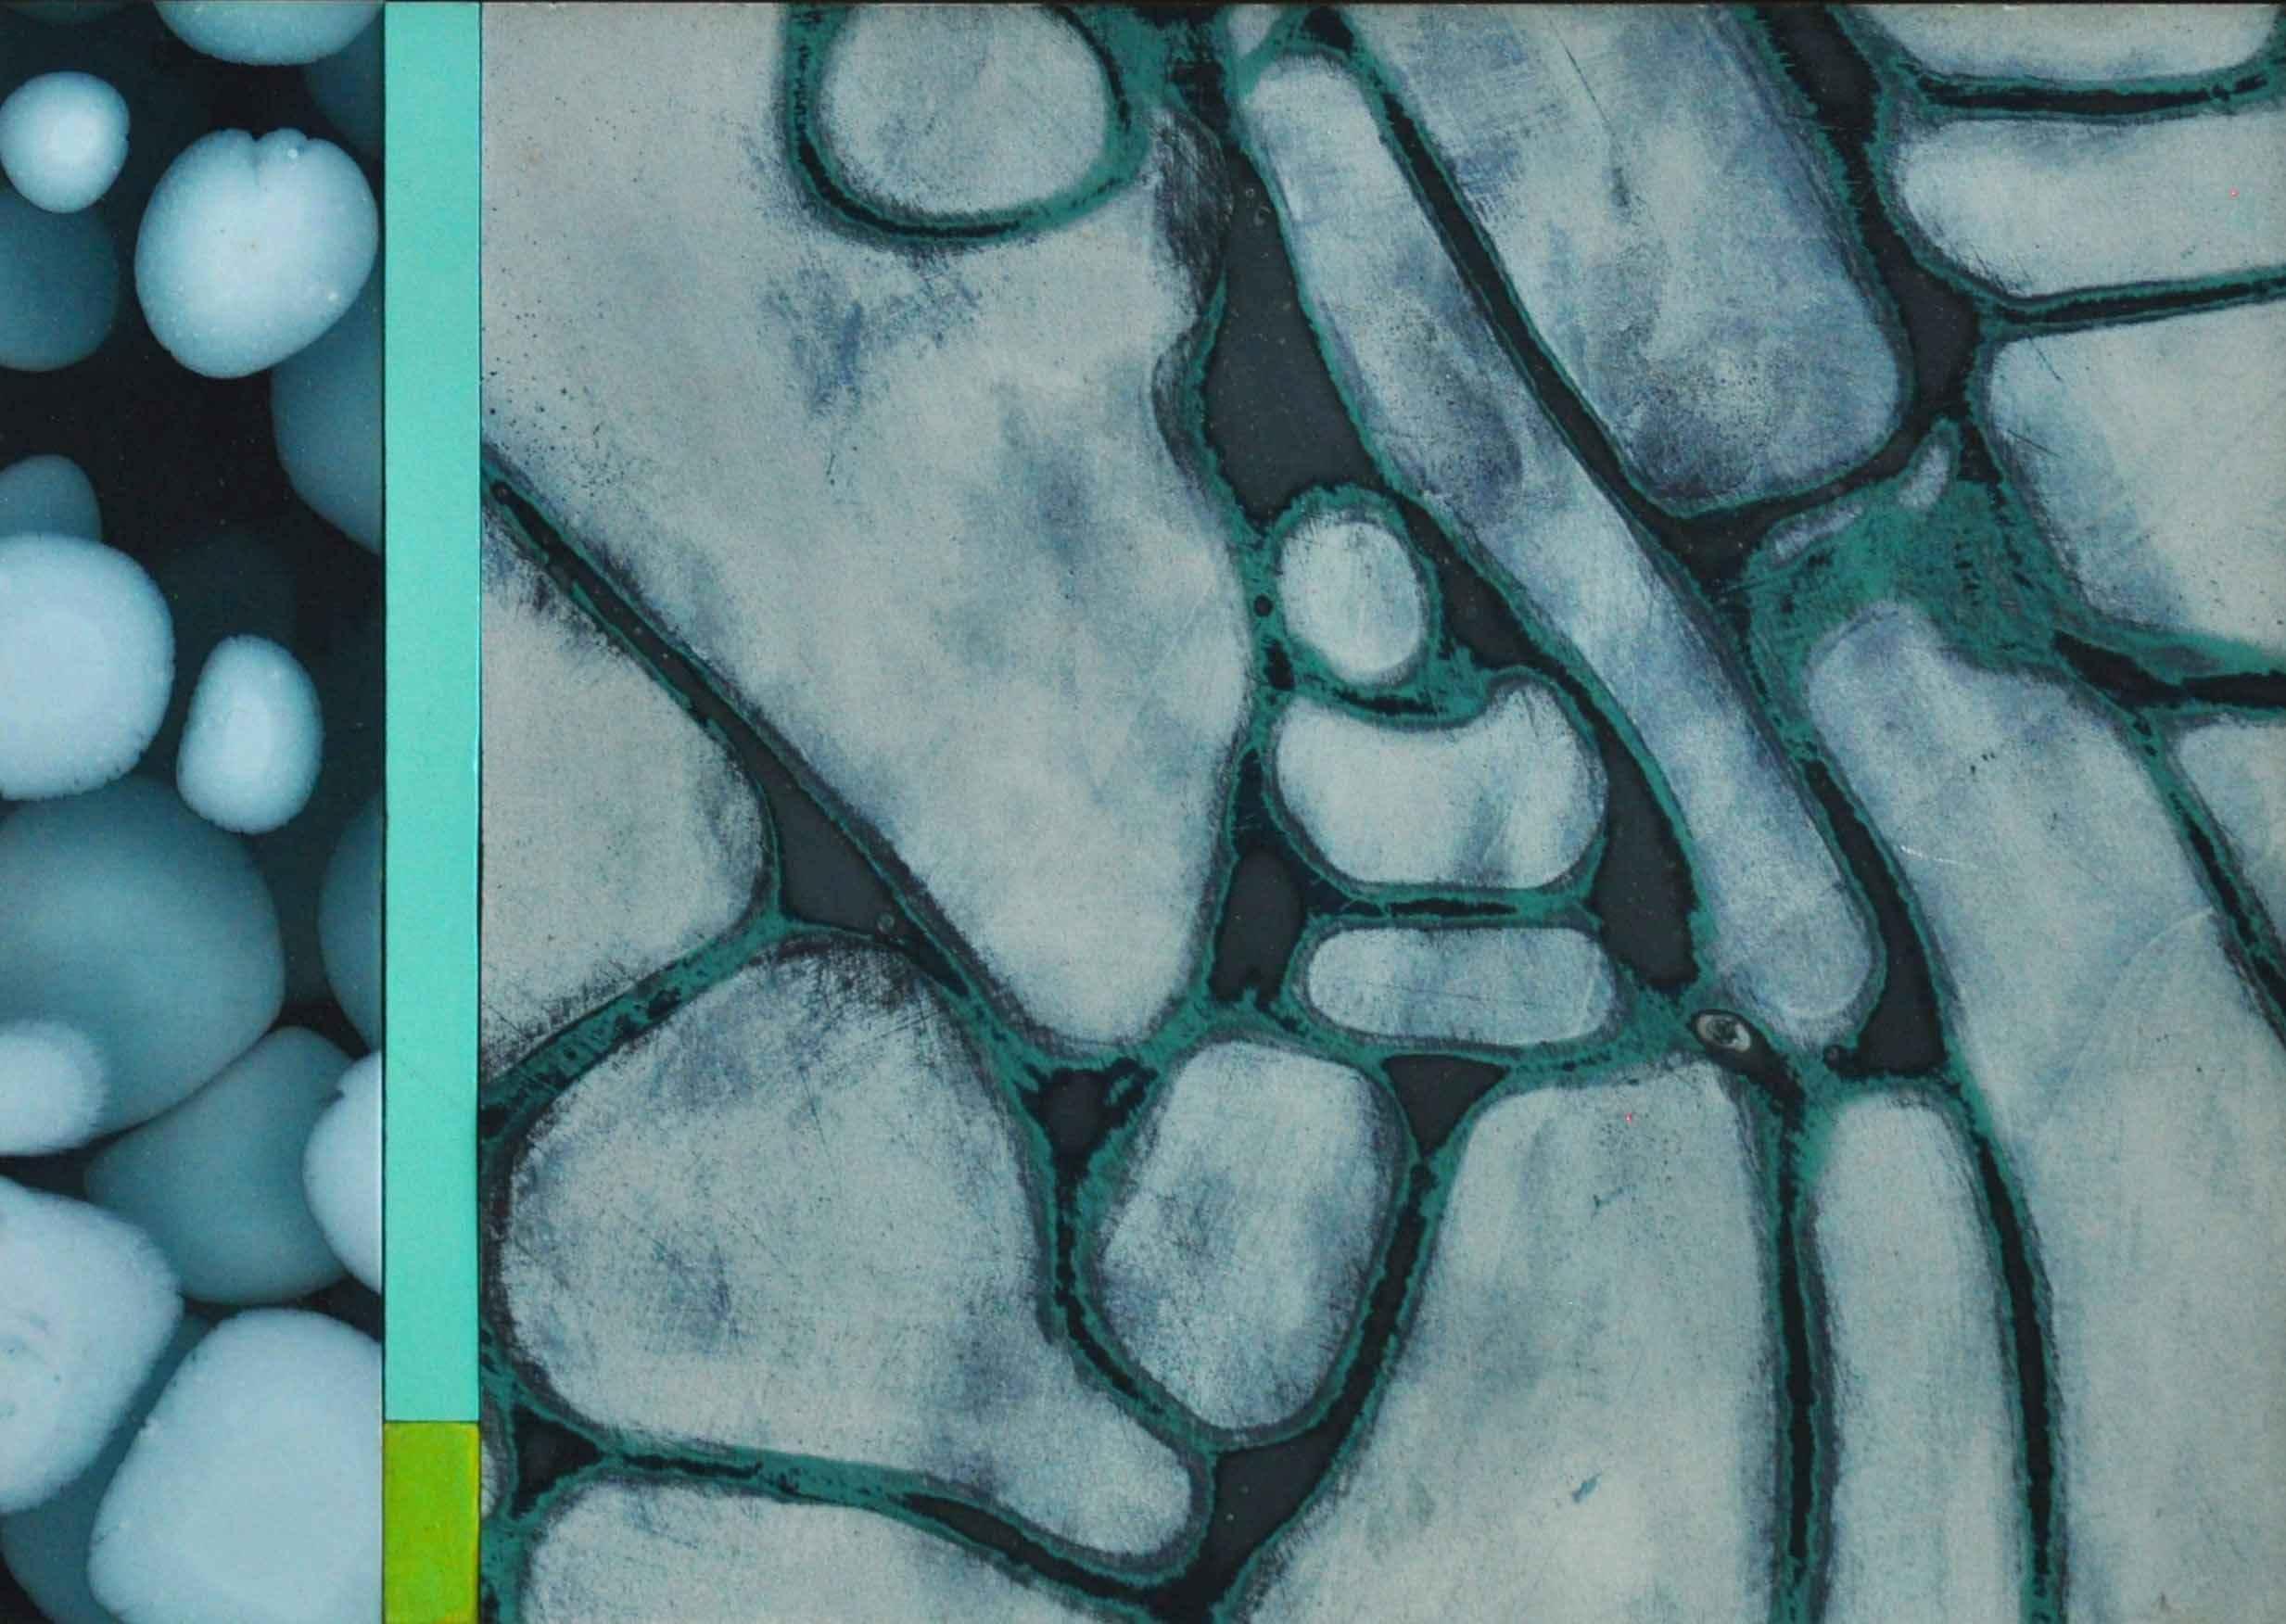 Shallows by  Susie White - Masterpiece Online